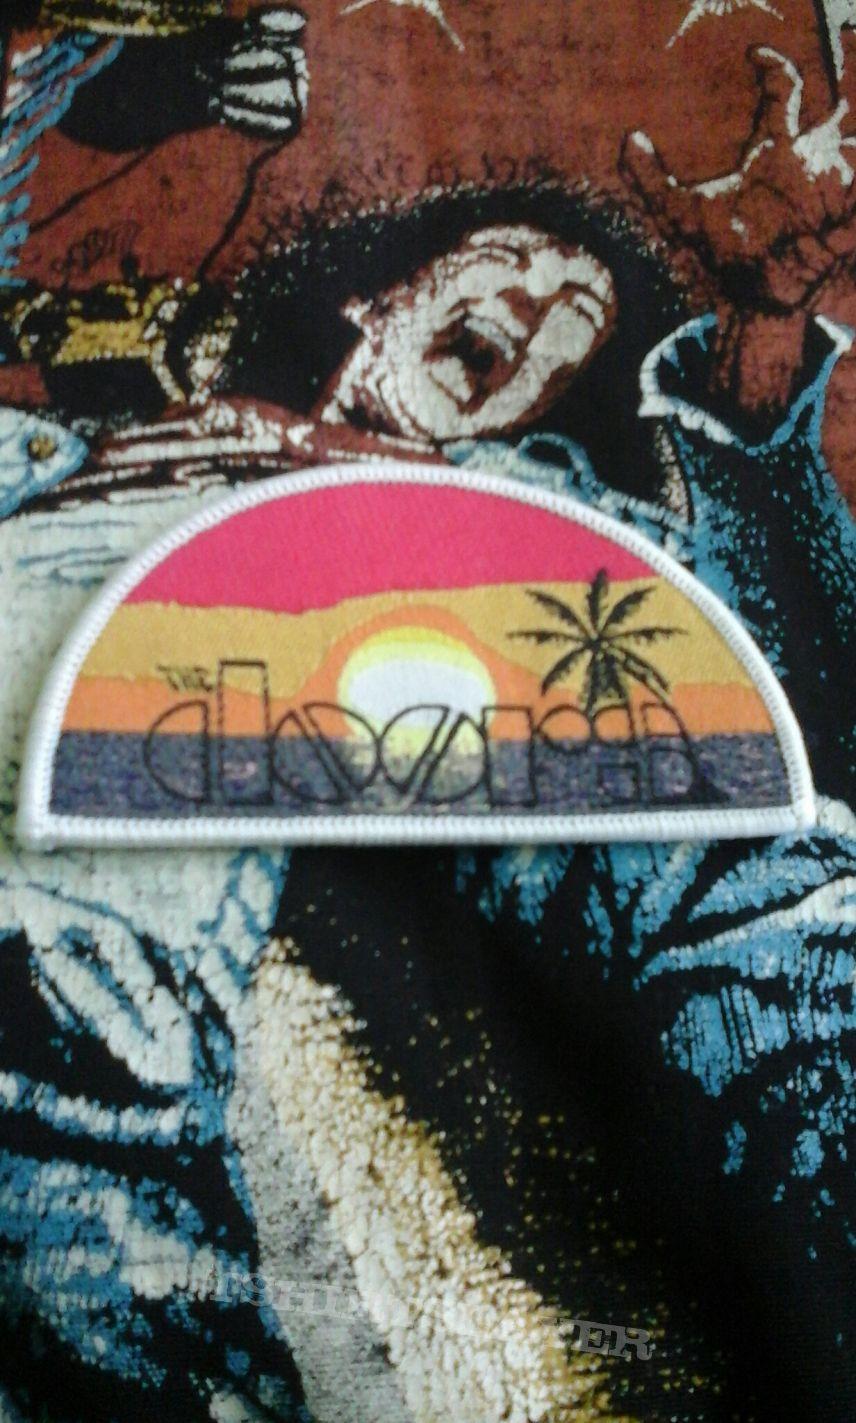 The Doors - Sunshine Beach woven patch